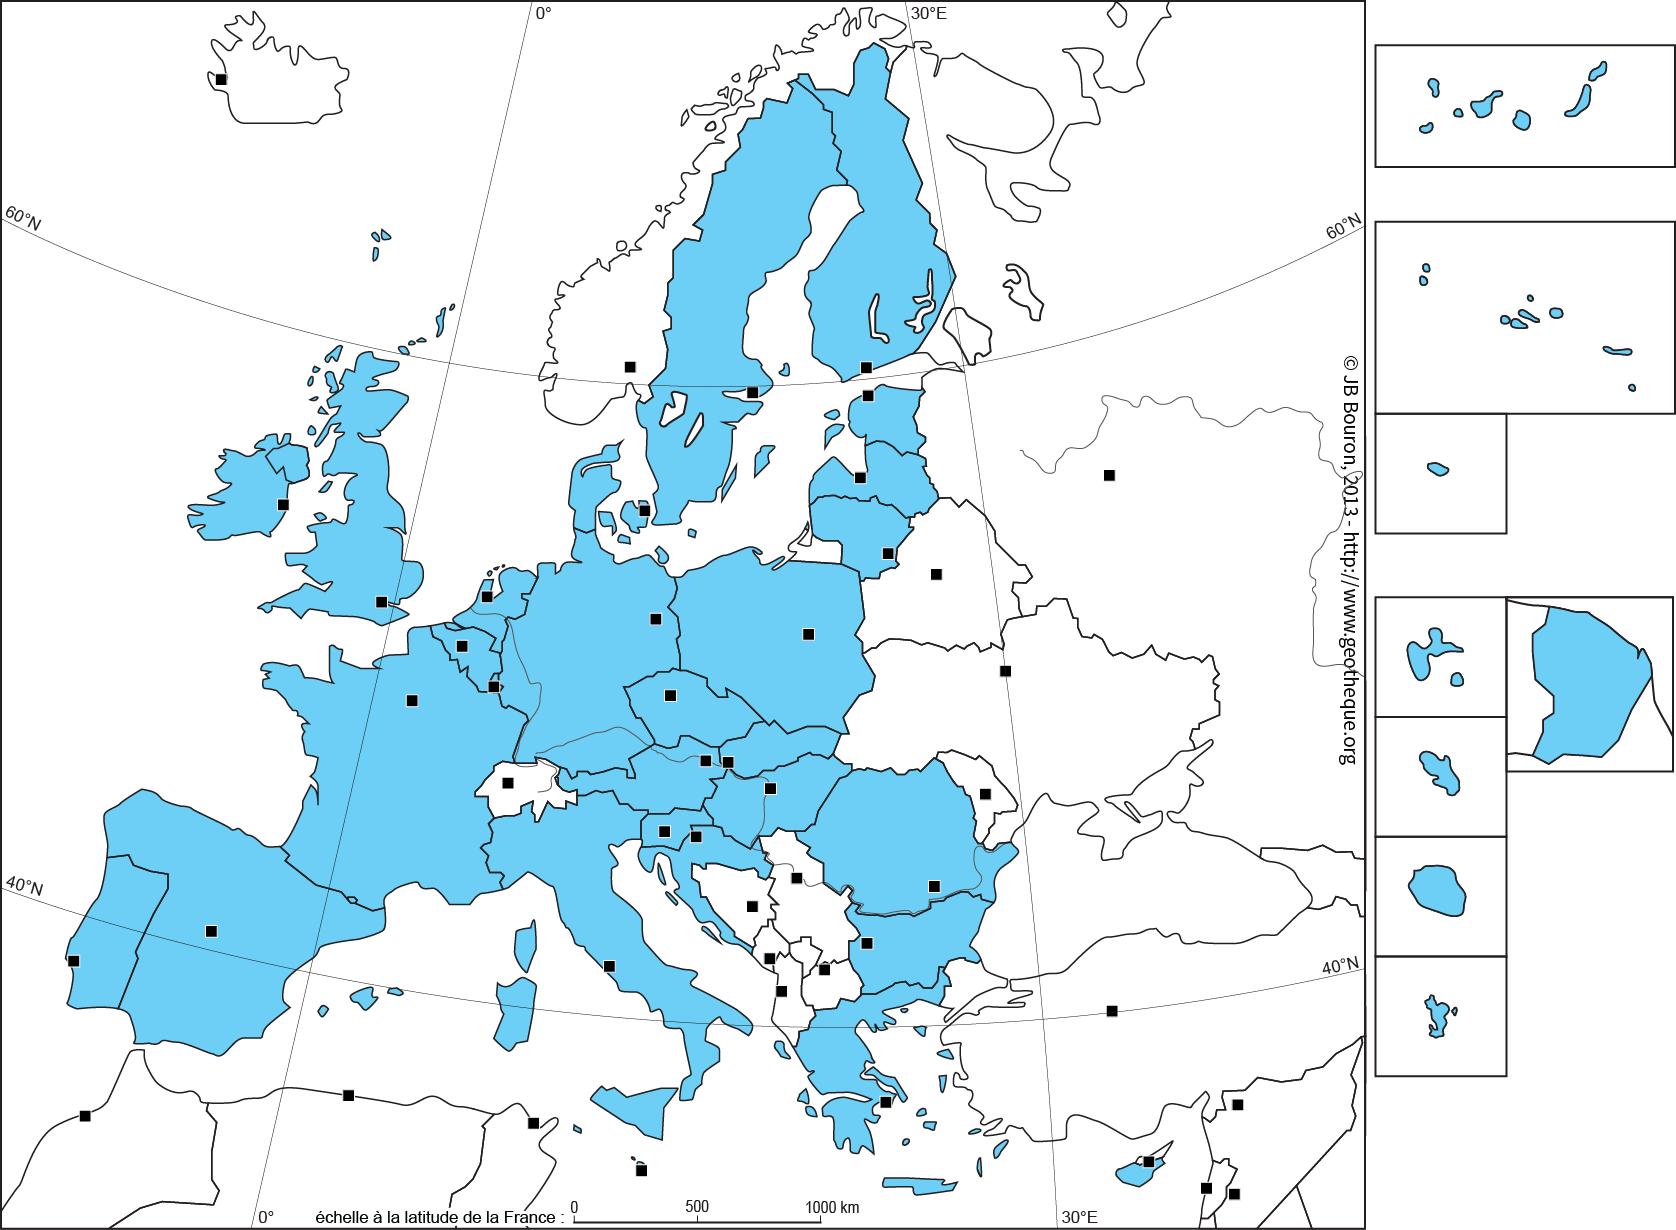 Fond de carte de lUnion européenne à 28 - UE28 - EU28 map